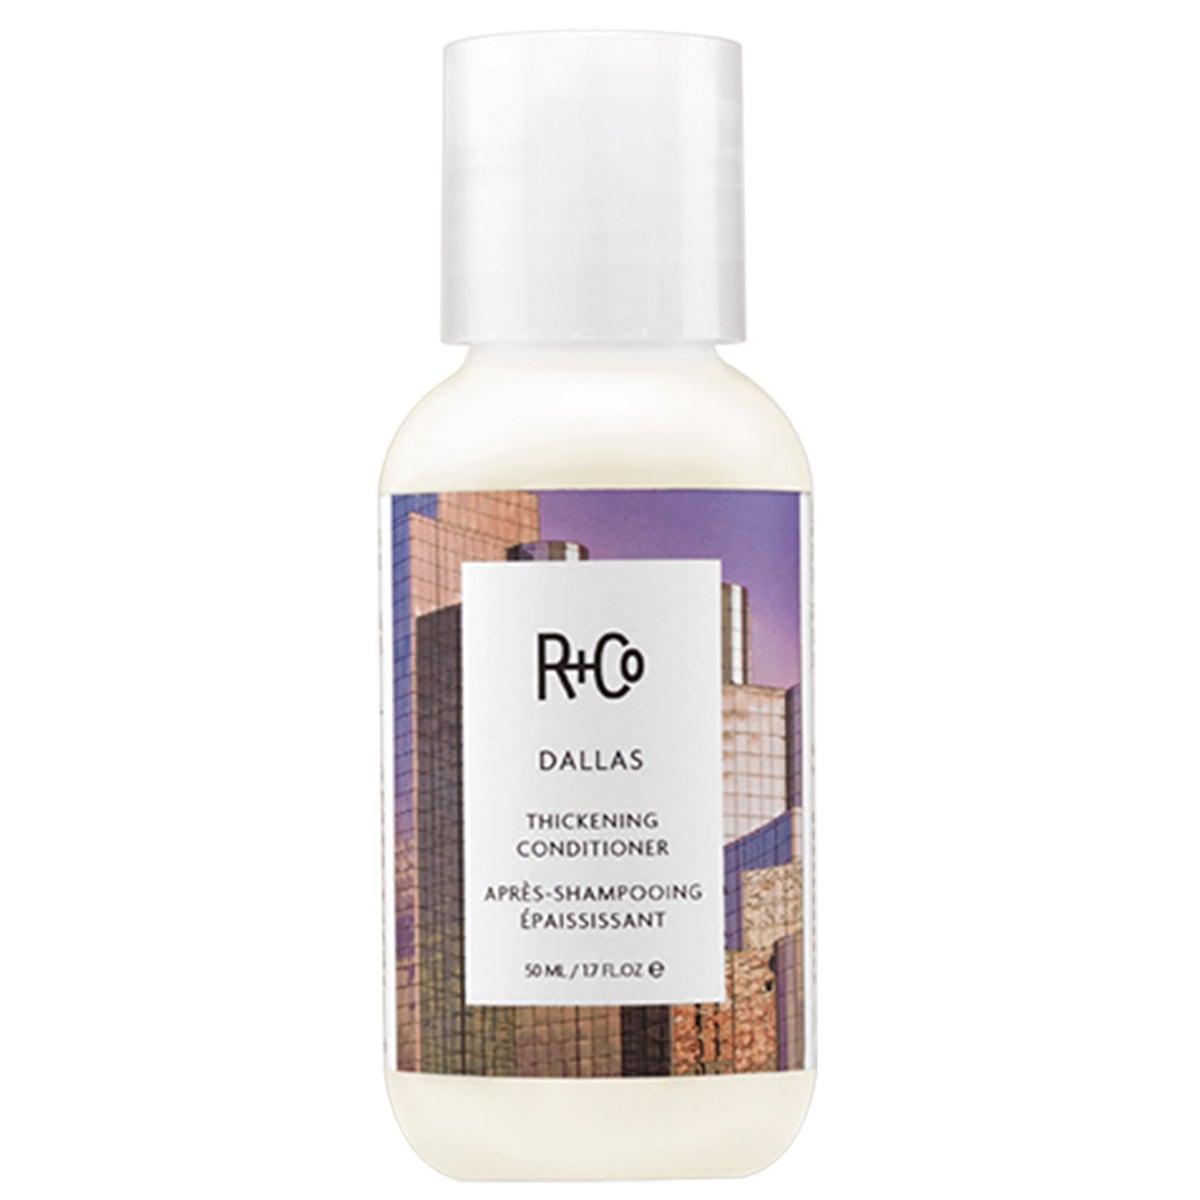 Dallas Thickening Conditioner 50 ml R+CO Balsam